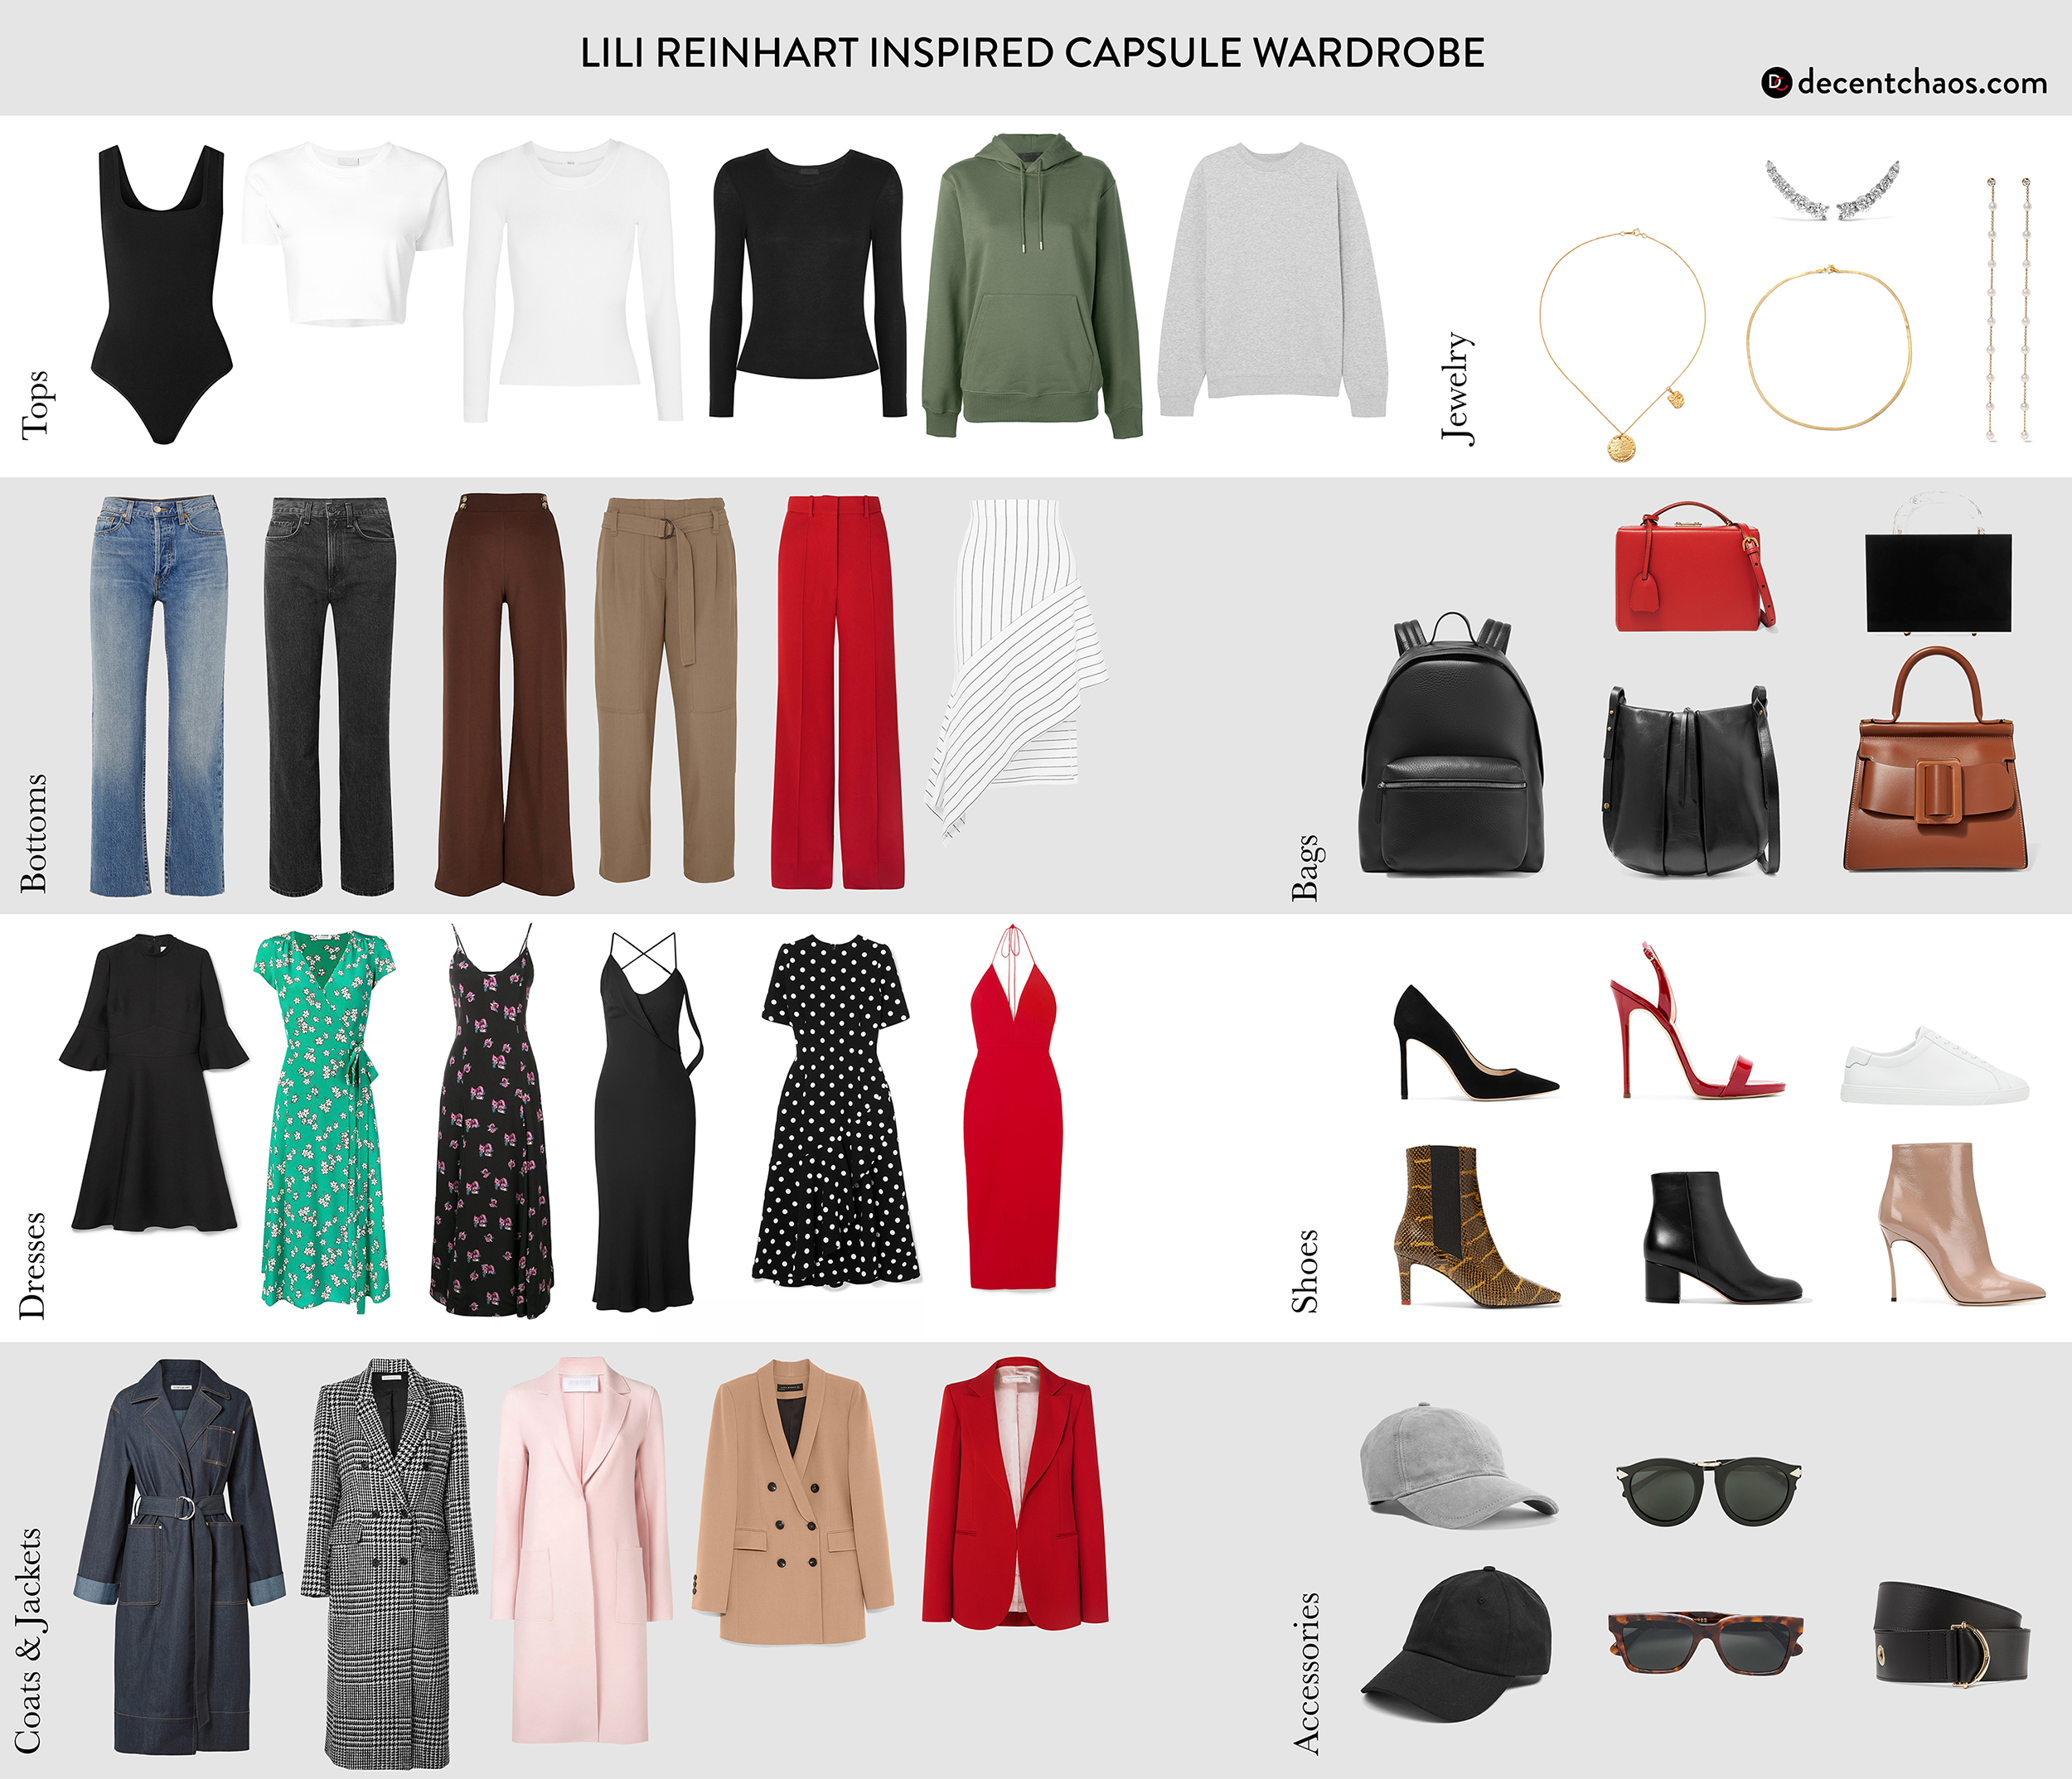 lili-reinhart-capsule-wardrobe.jpg